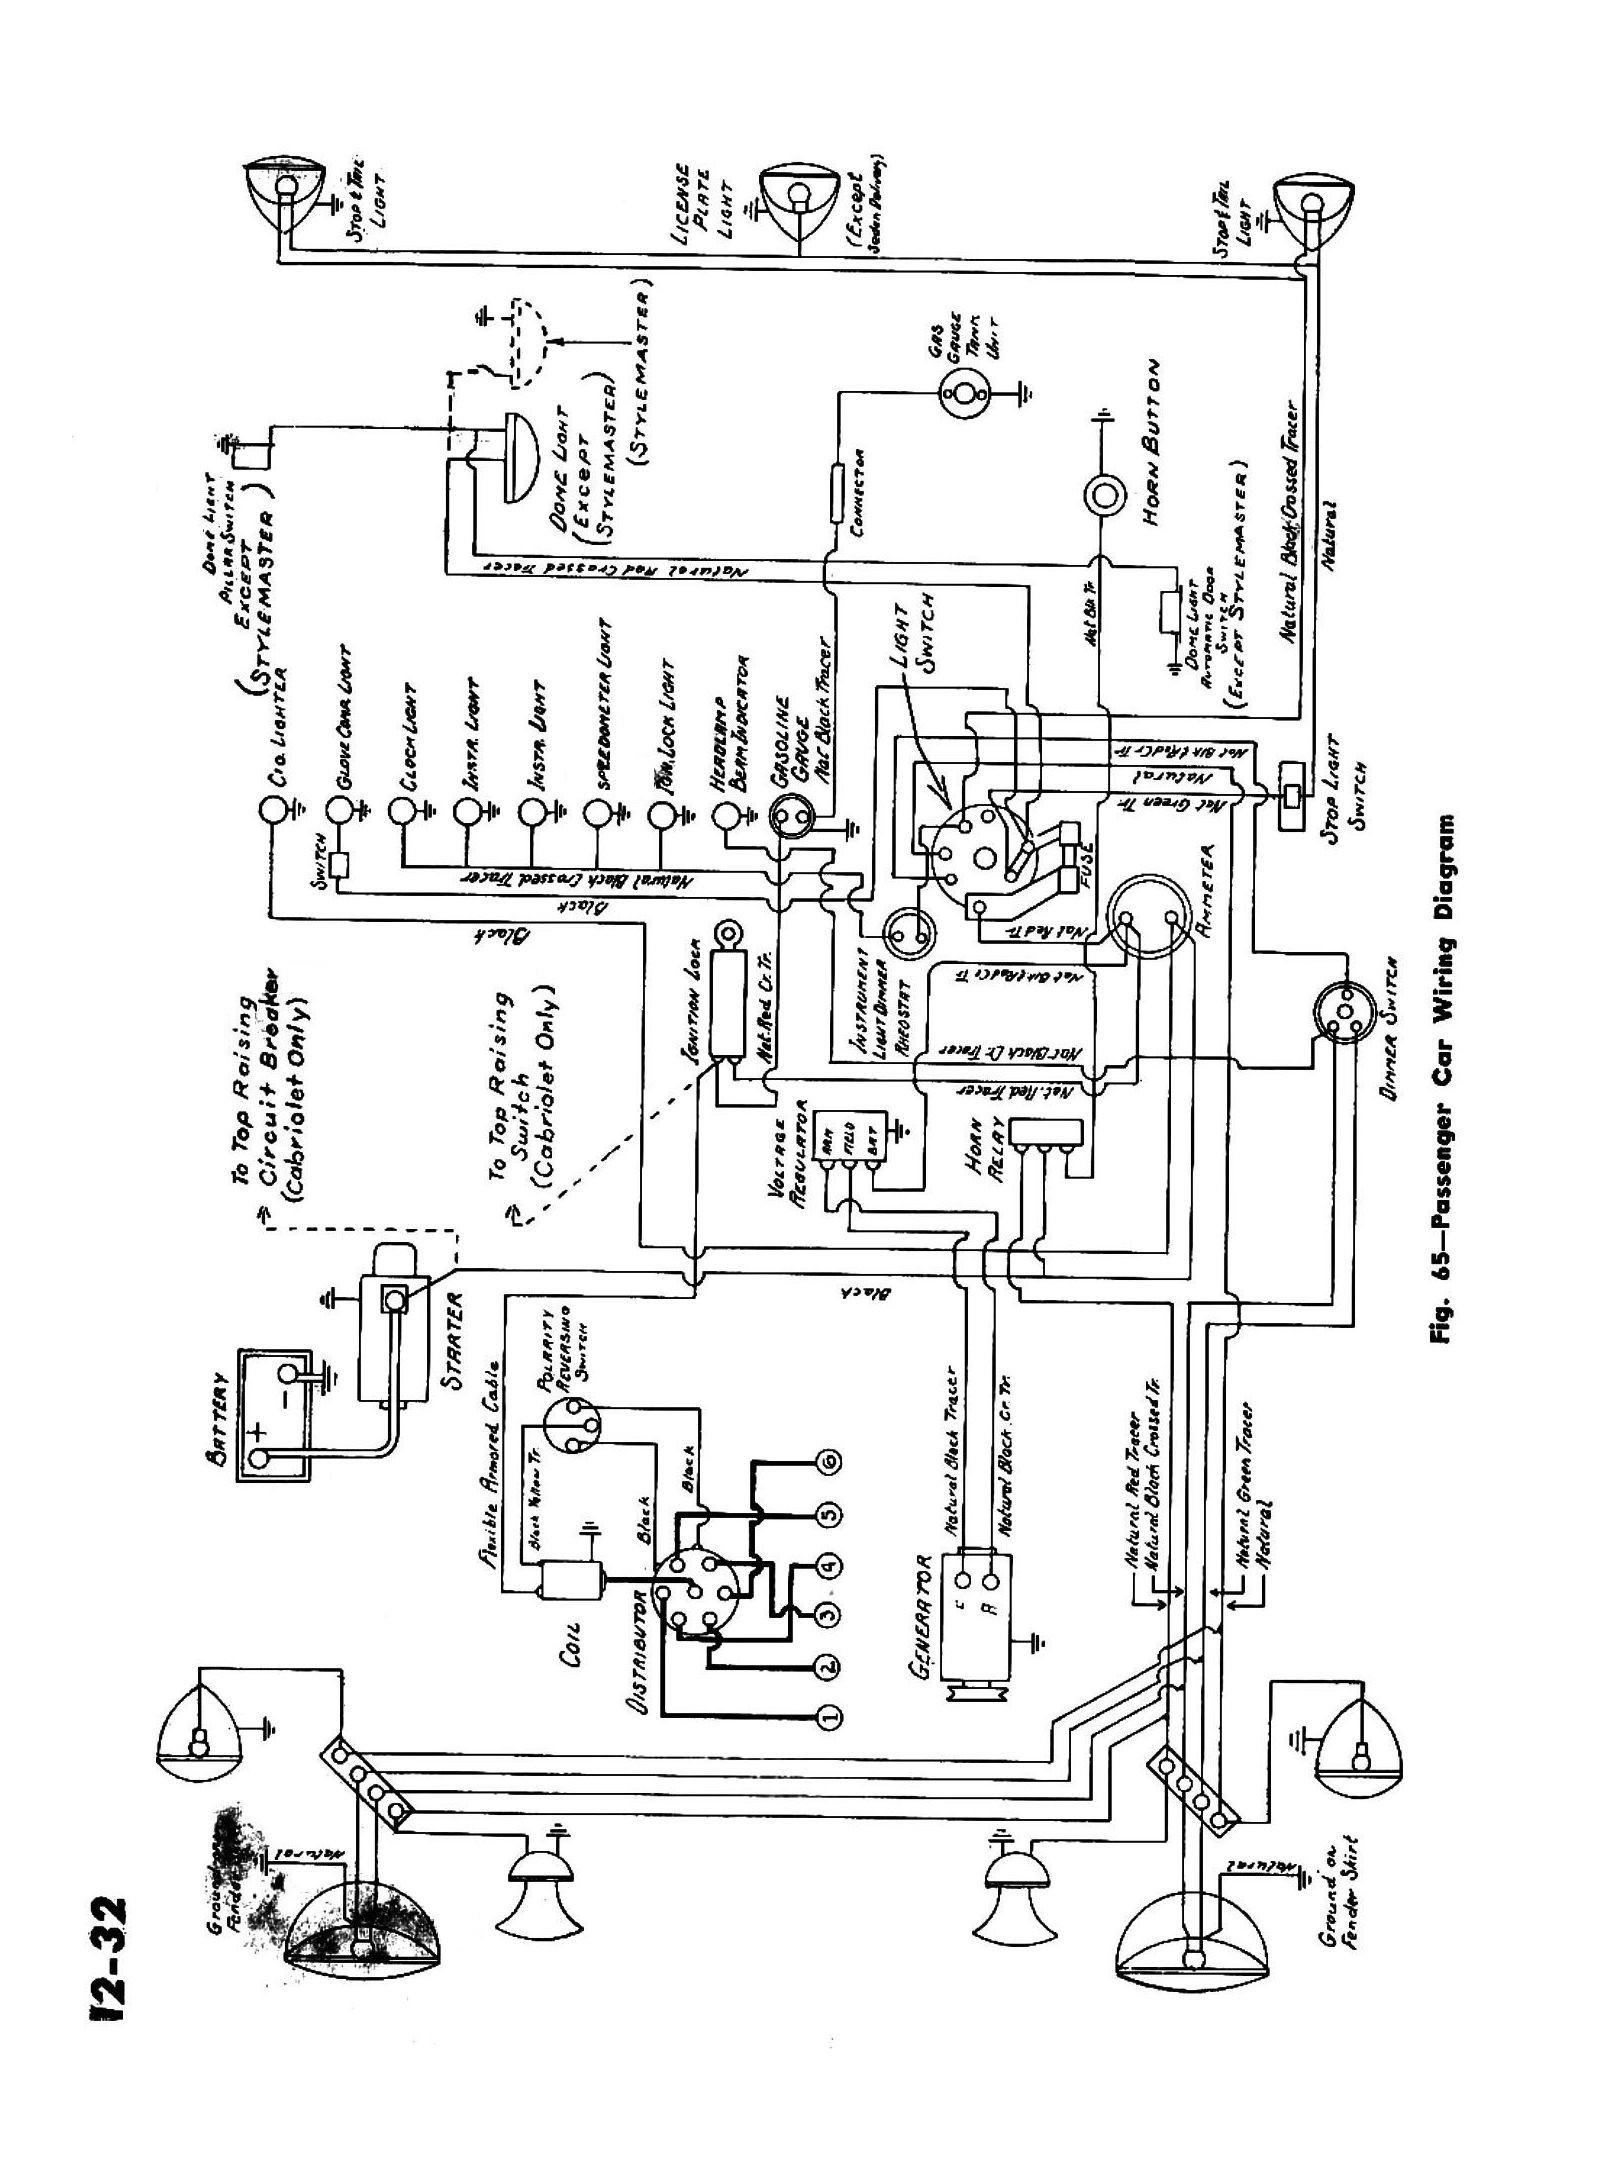 rt100 wiring diagram wiring circuit u2022 rh wiringonline today Schematic Circuit Diagram Electronic Circuit Diagrams